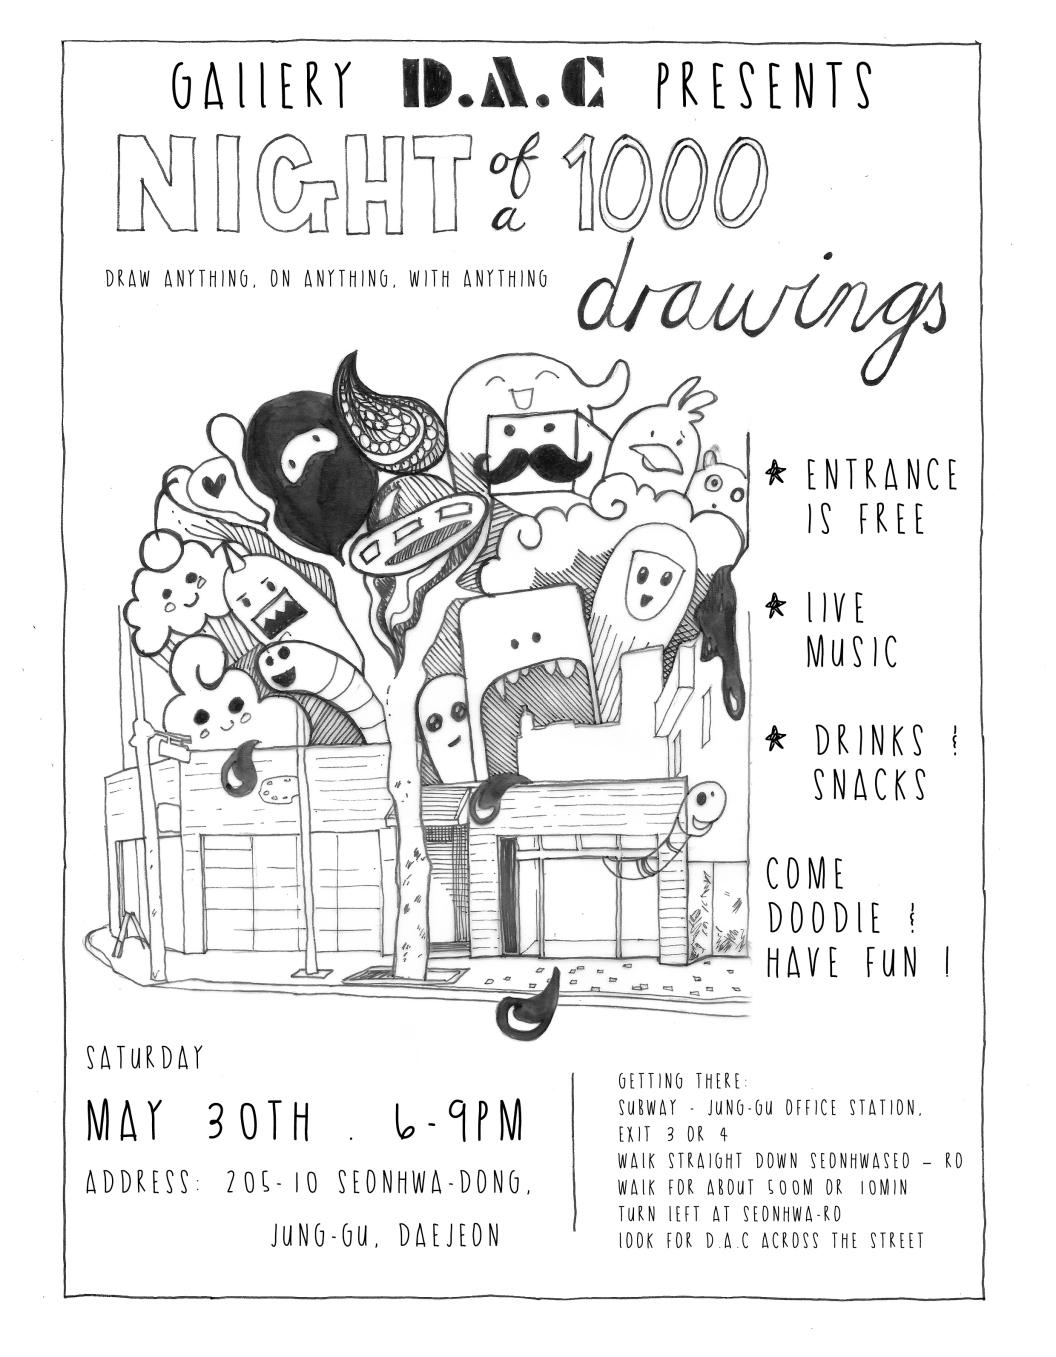 1000 drawings_poster